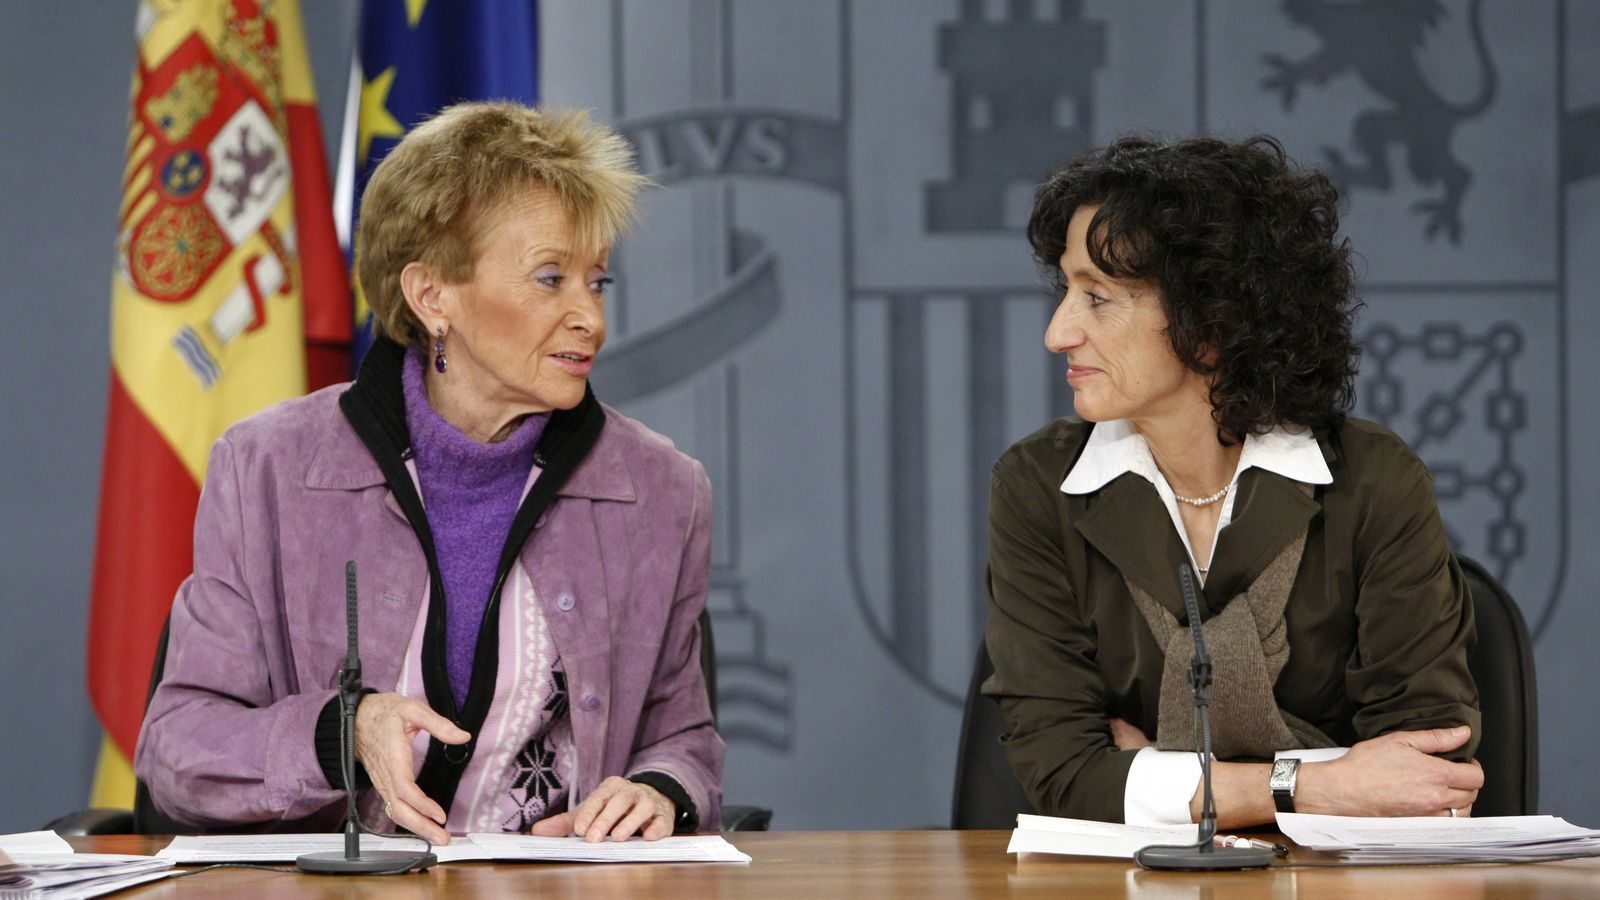 María Teresa Fernández de la Vega presidirà el Consell d'Estat